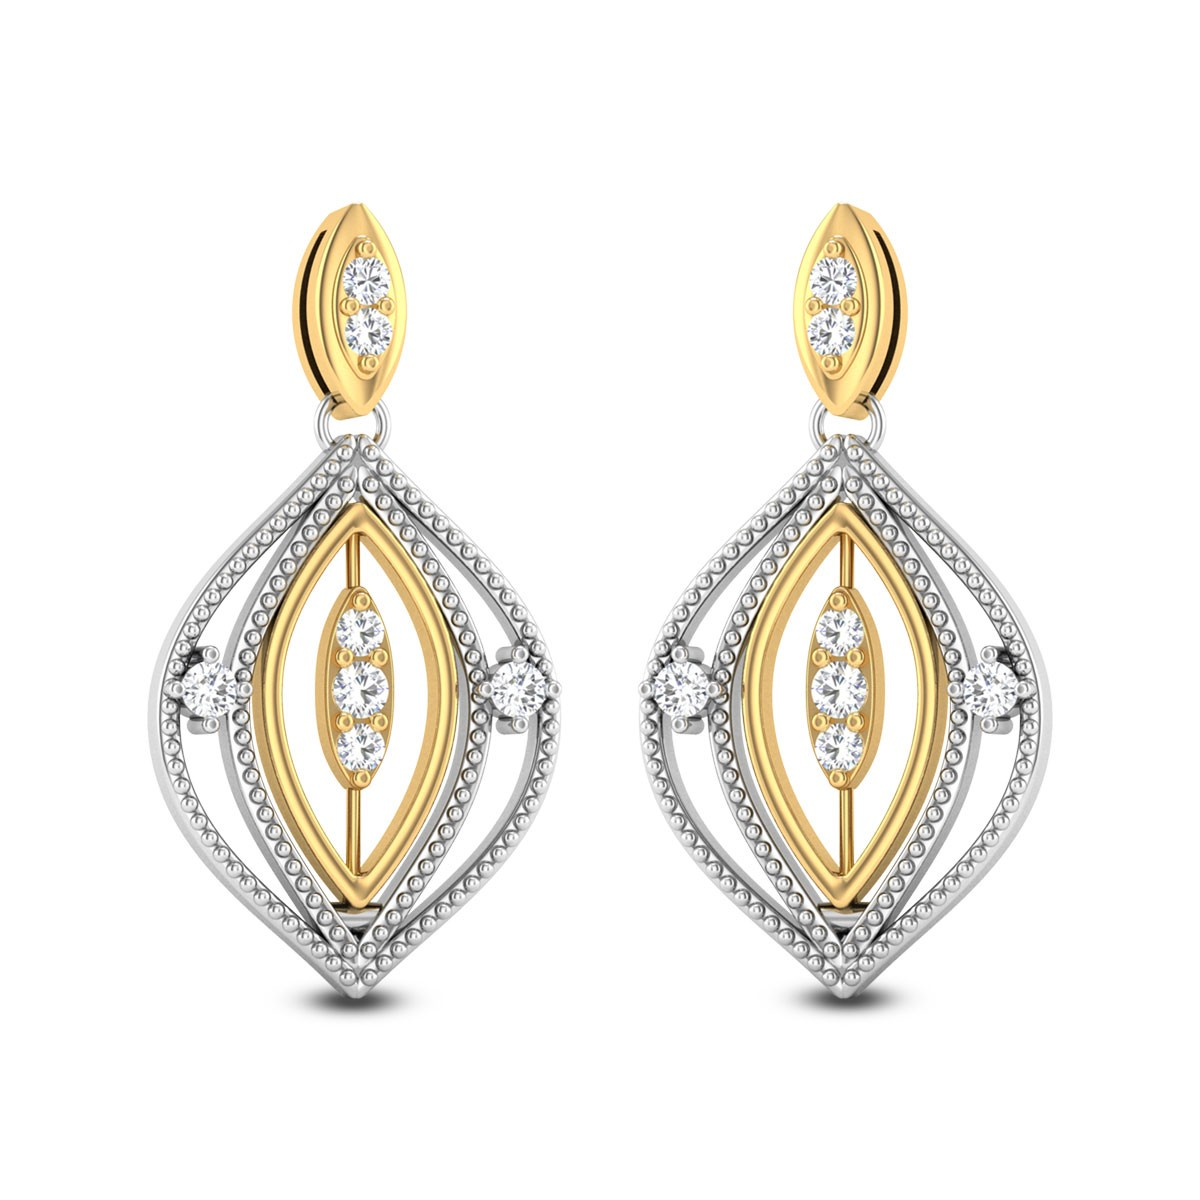 Desira Diamond Earrings